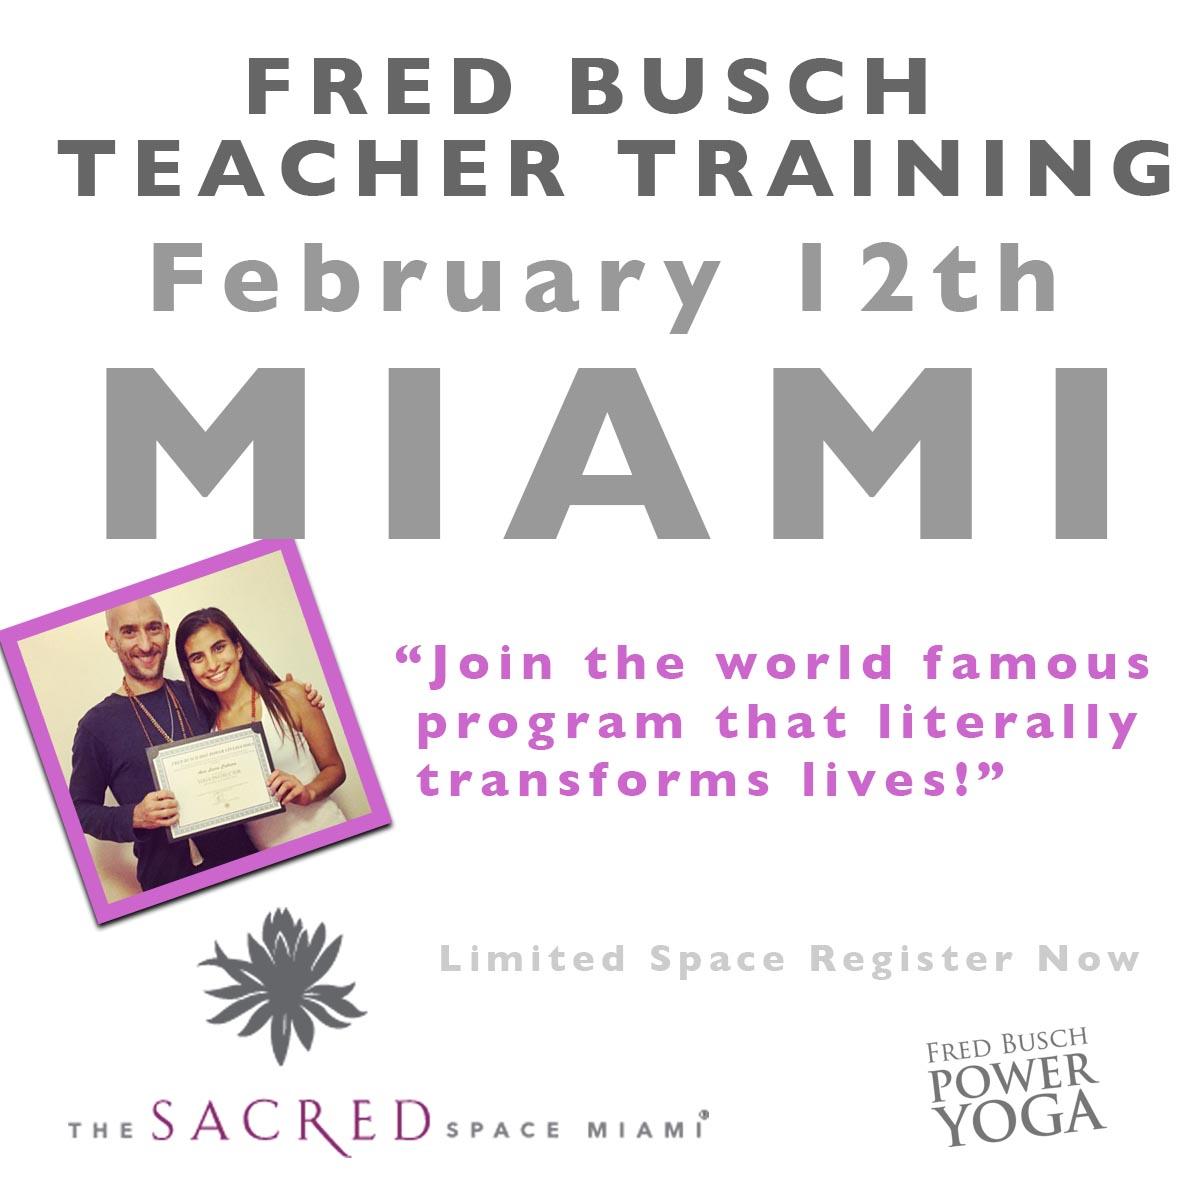 Miami Yoga Teacher Training 2018 with Fred Busch